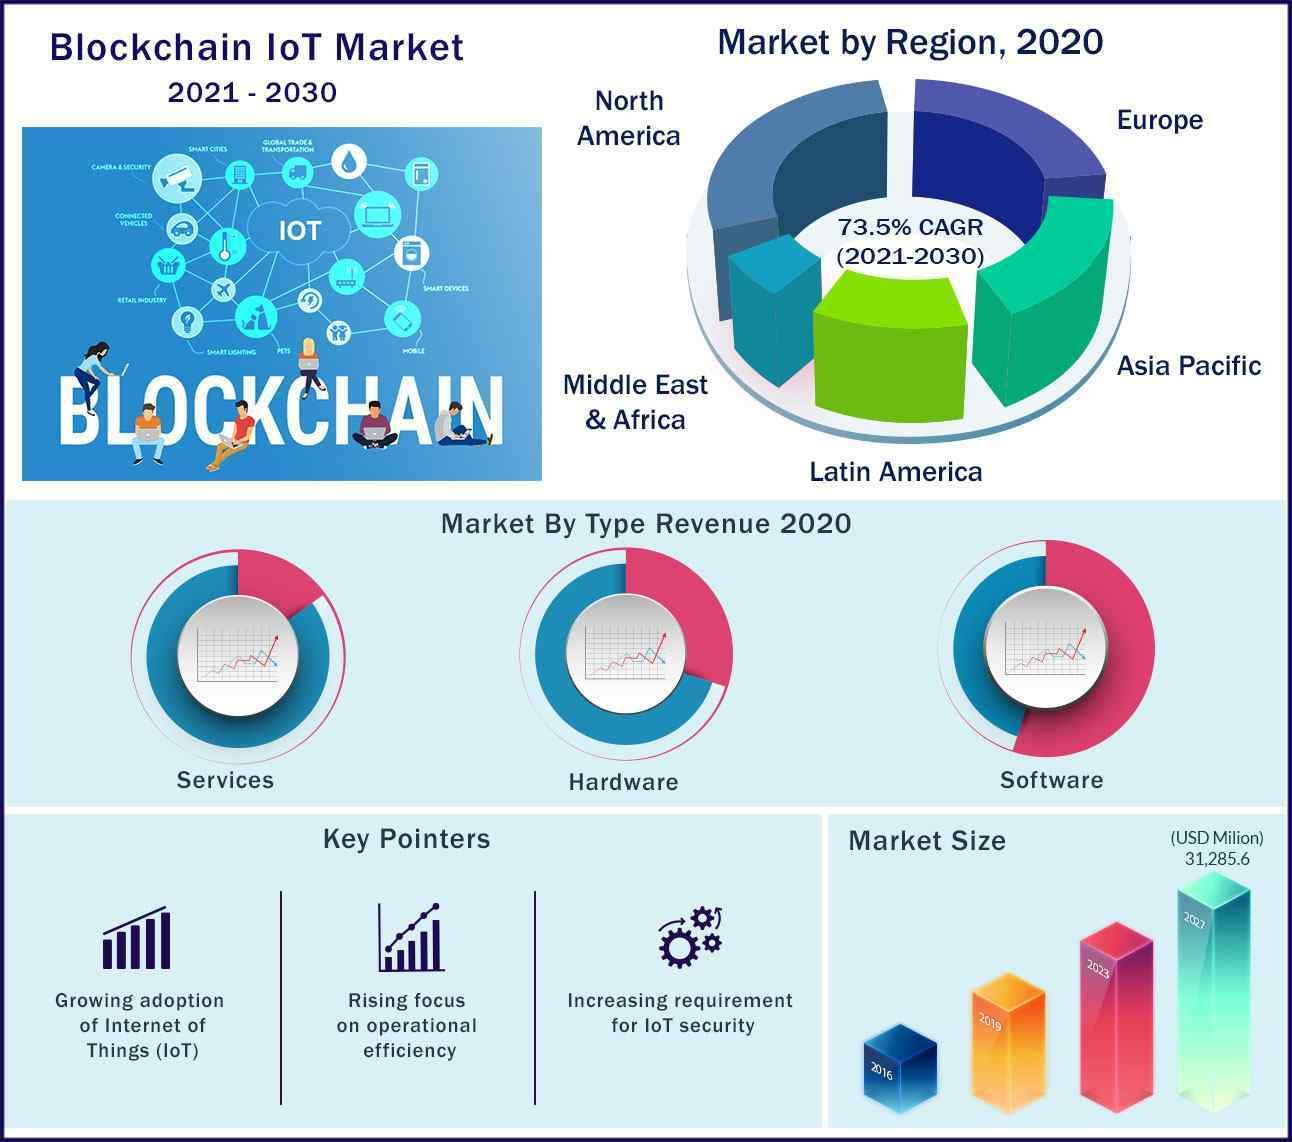 Global Blockchain IoT Market 2021 to 2030